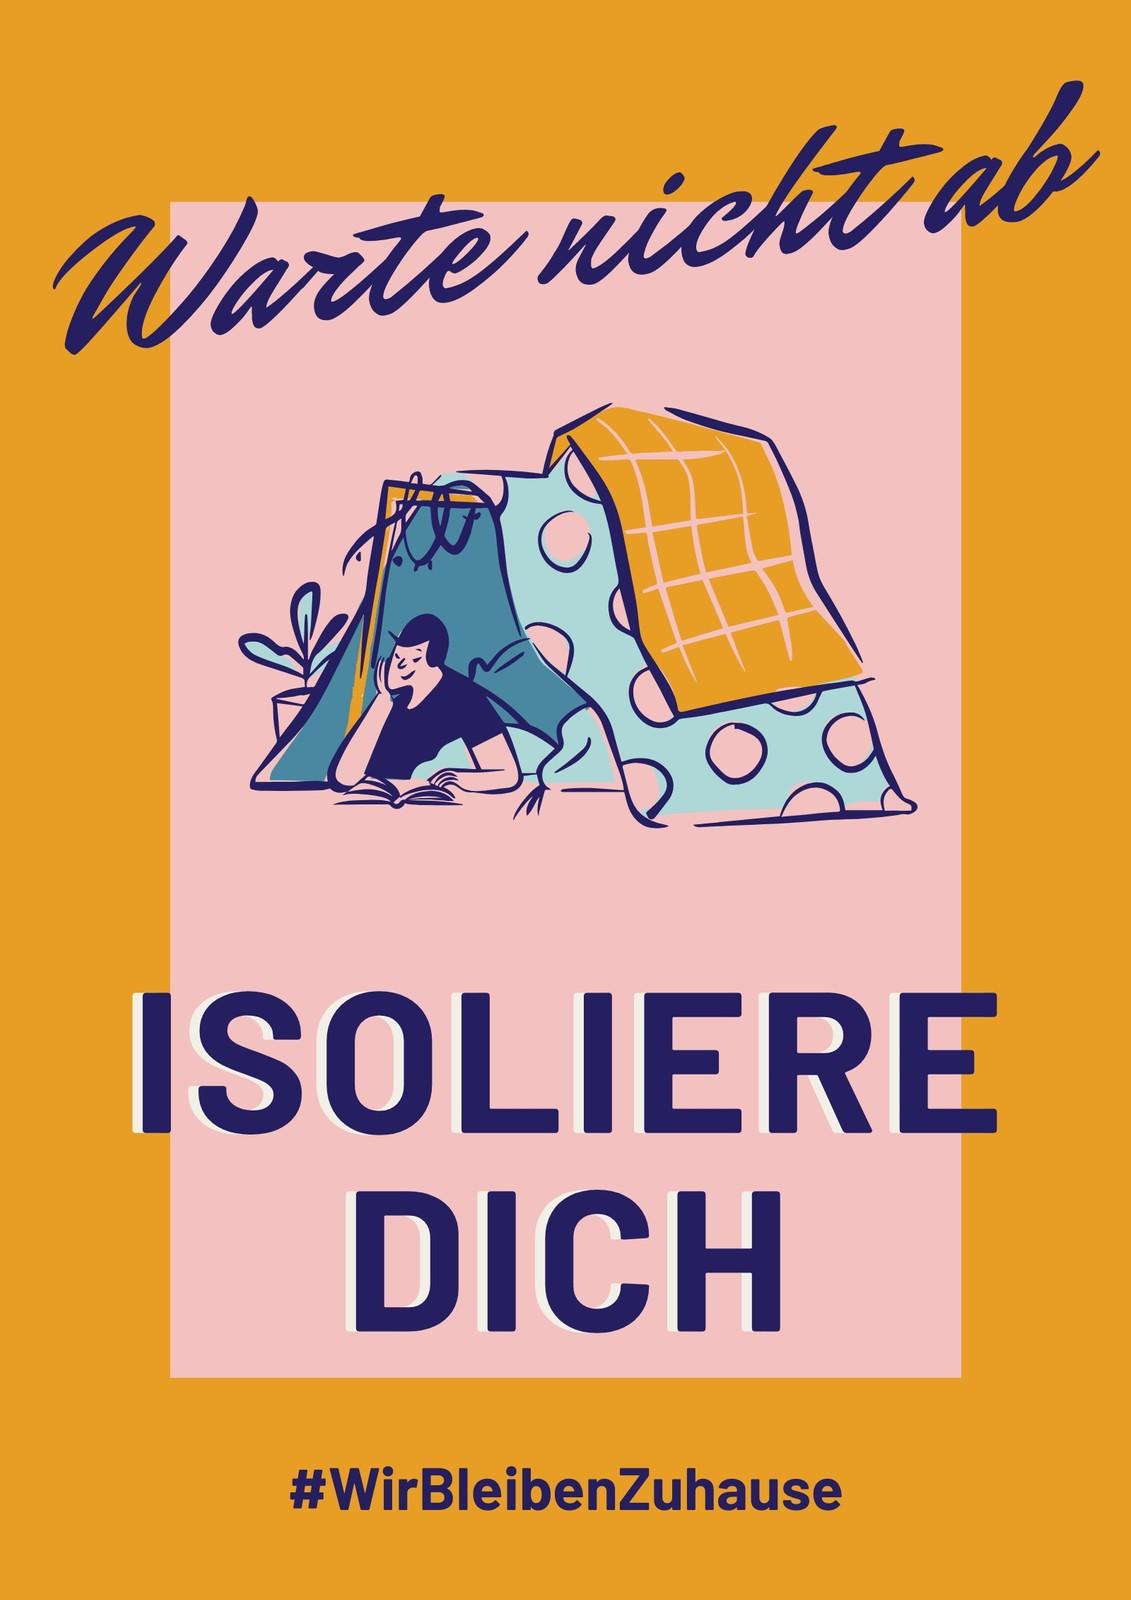 Gelb-pinkes Selbstisolation Gesundheits-Poster